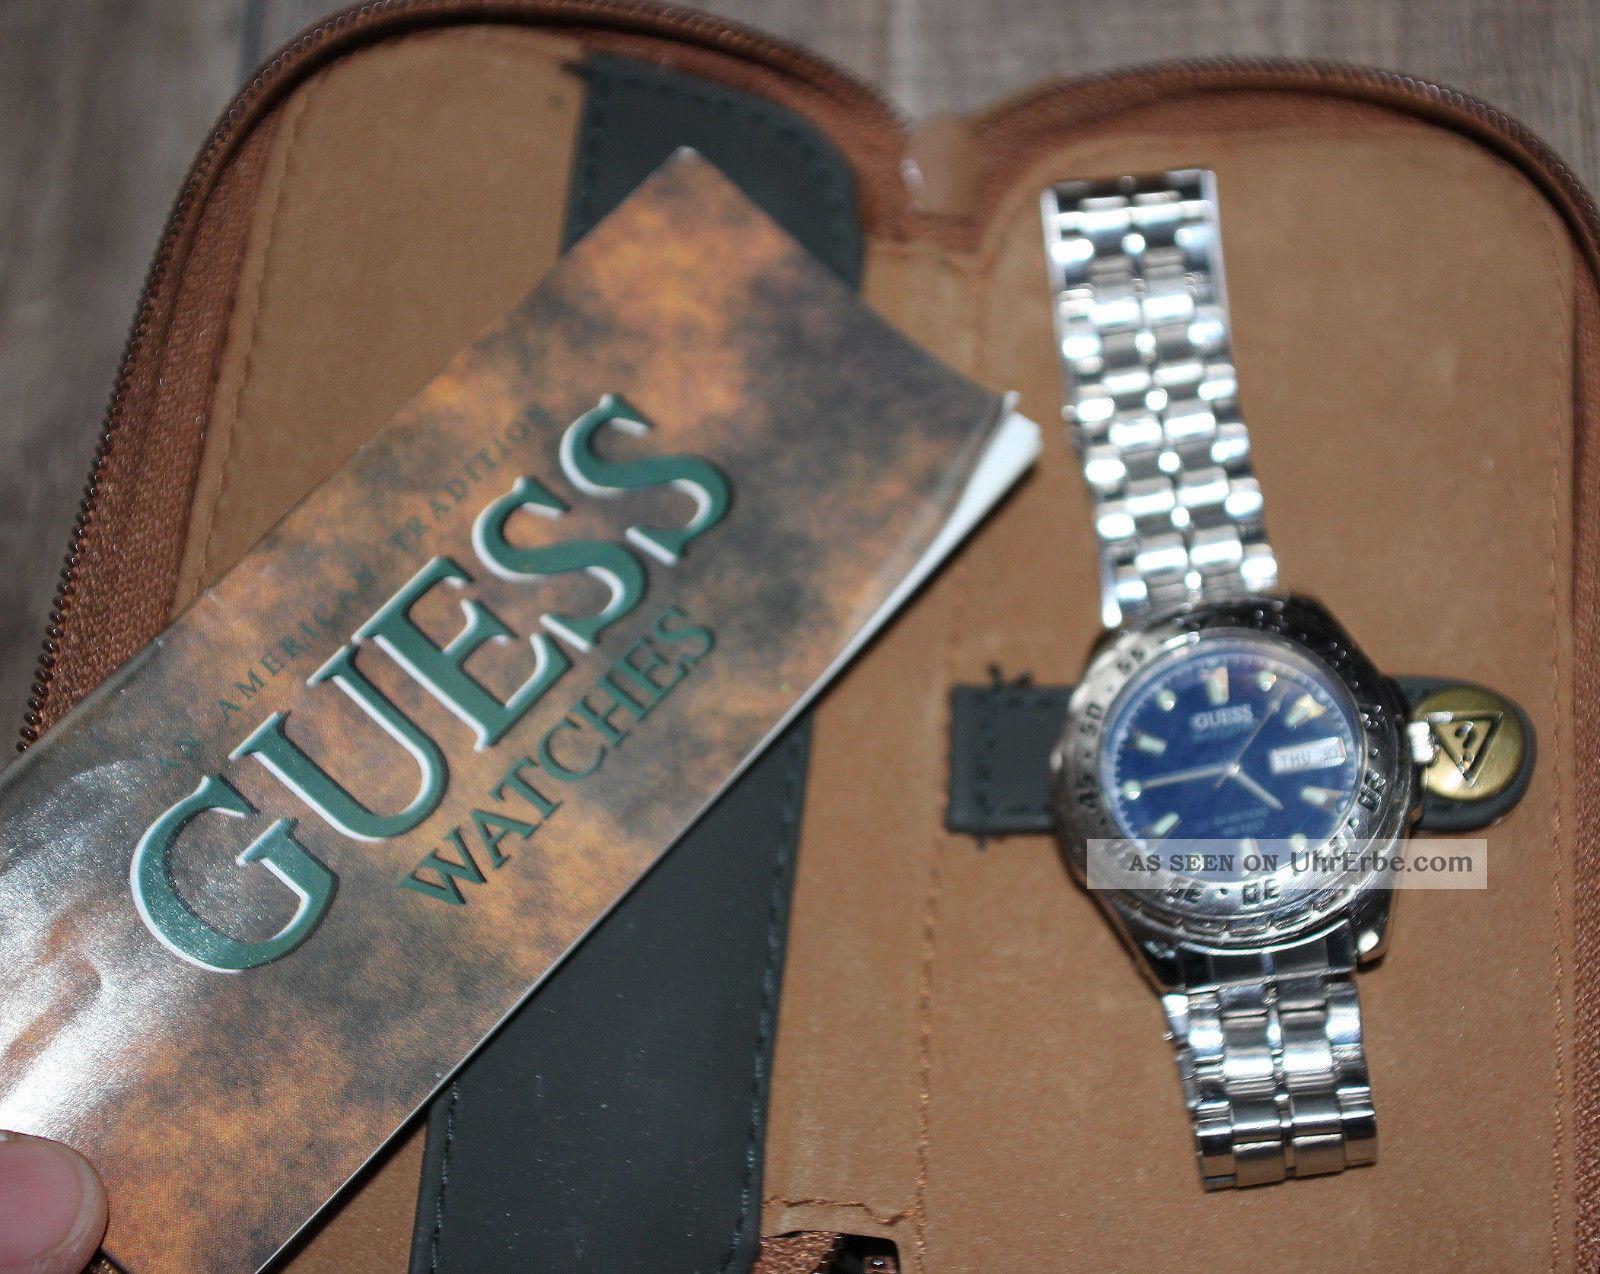 Herren Armbanduhr V.  Guess Edelstahl Mit Etui Silber Blau W10 Armbanduhren Bild